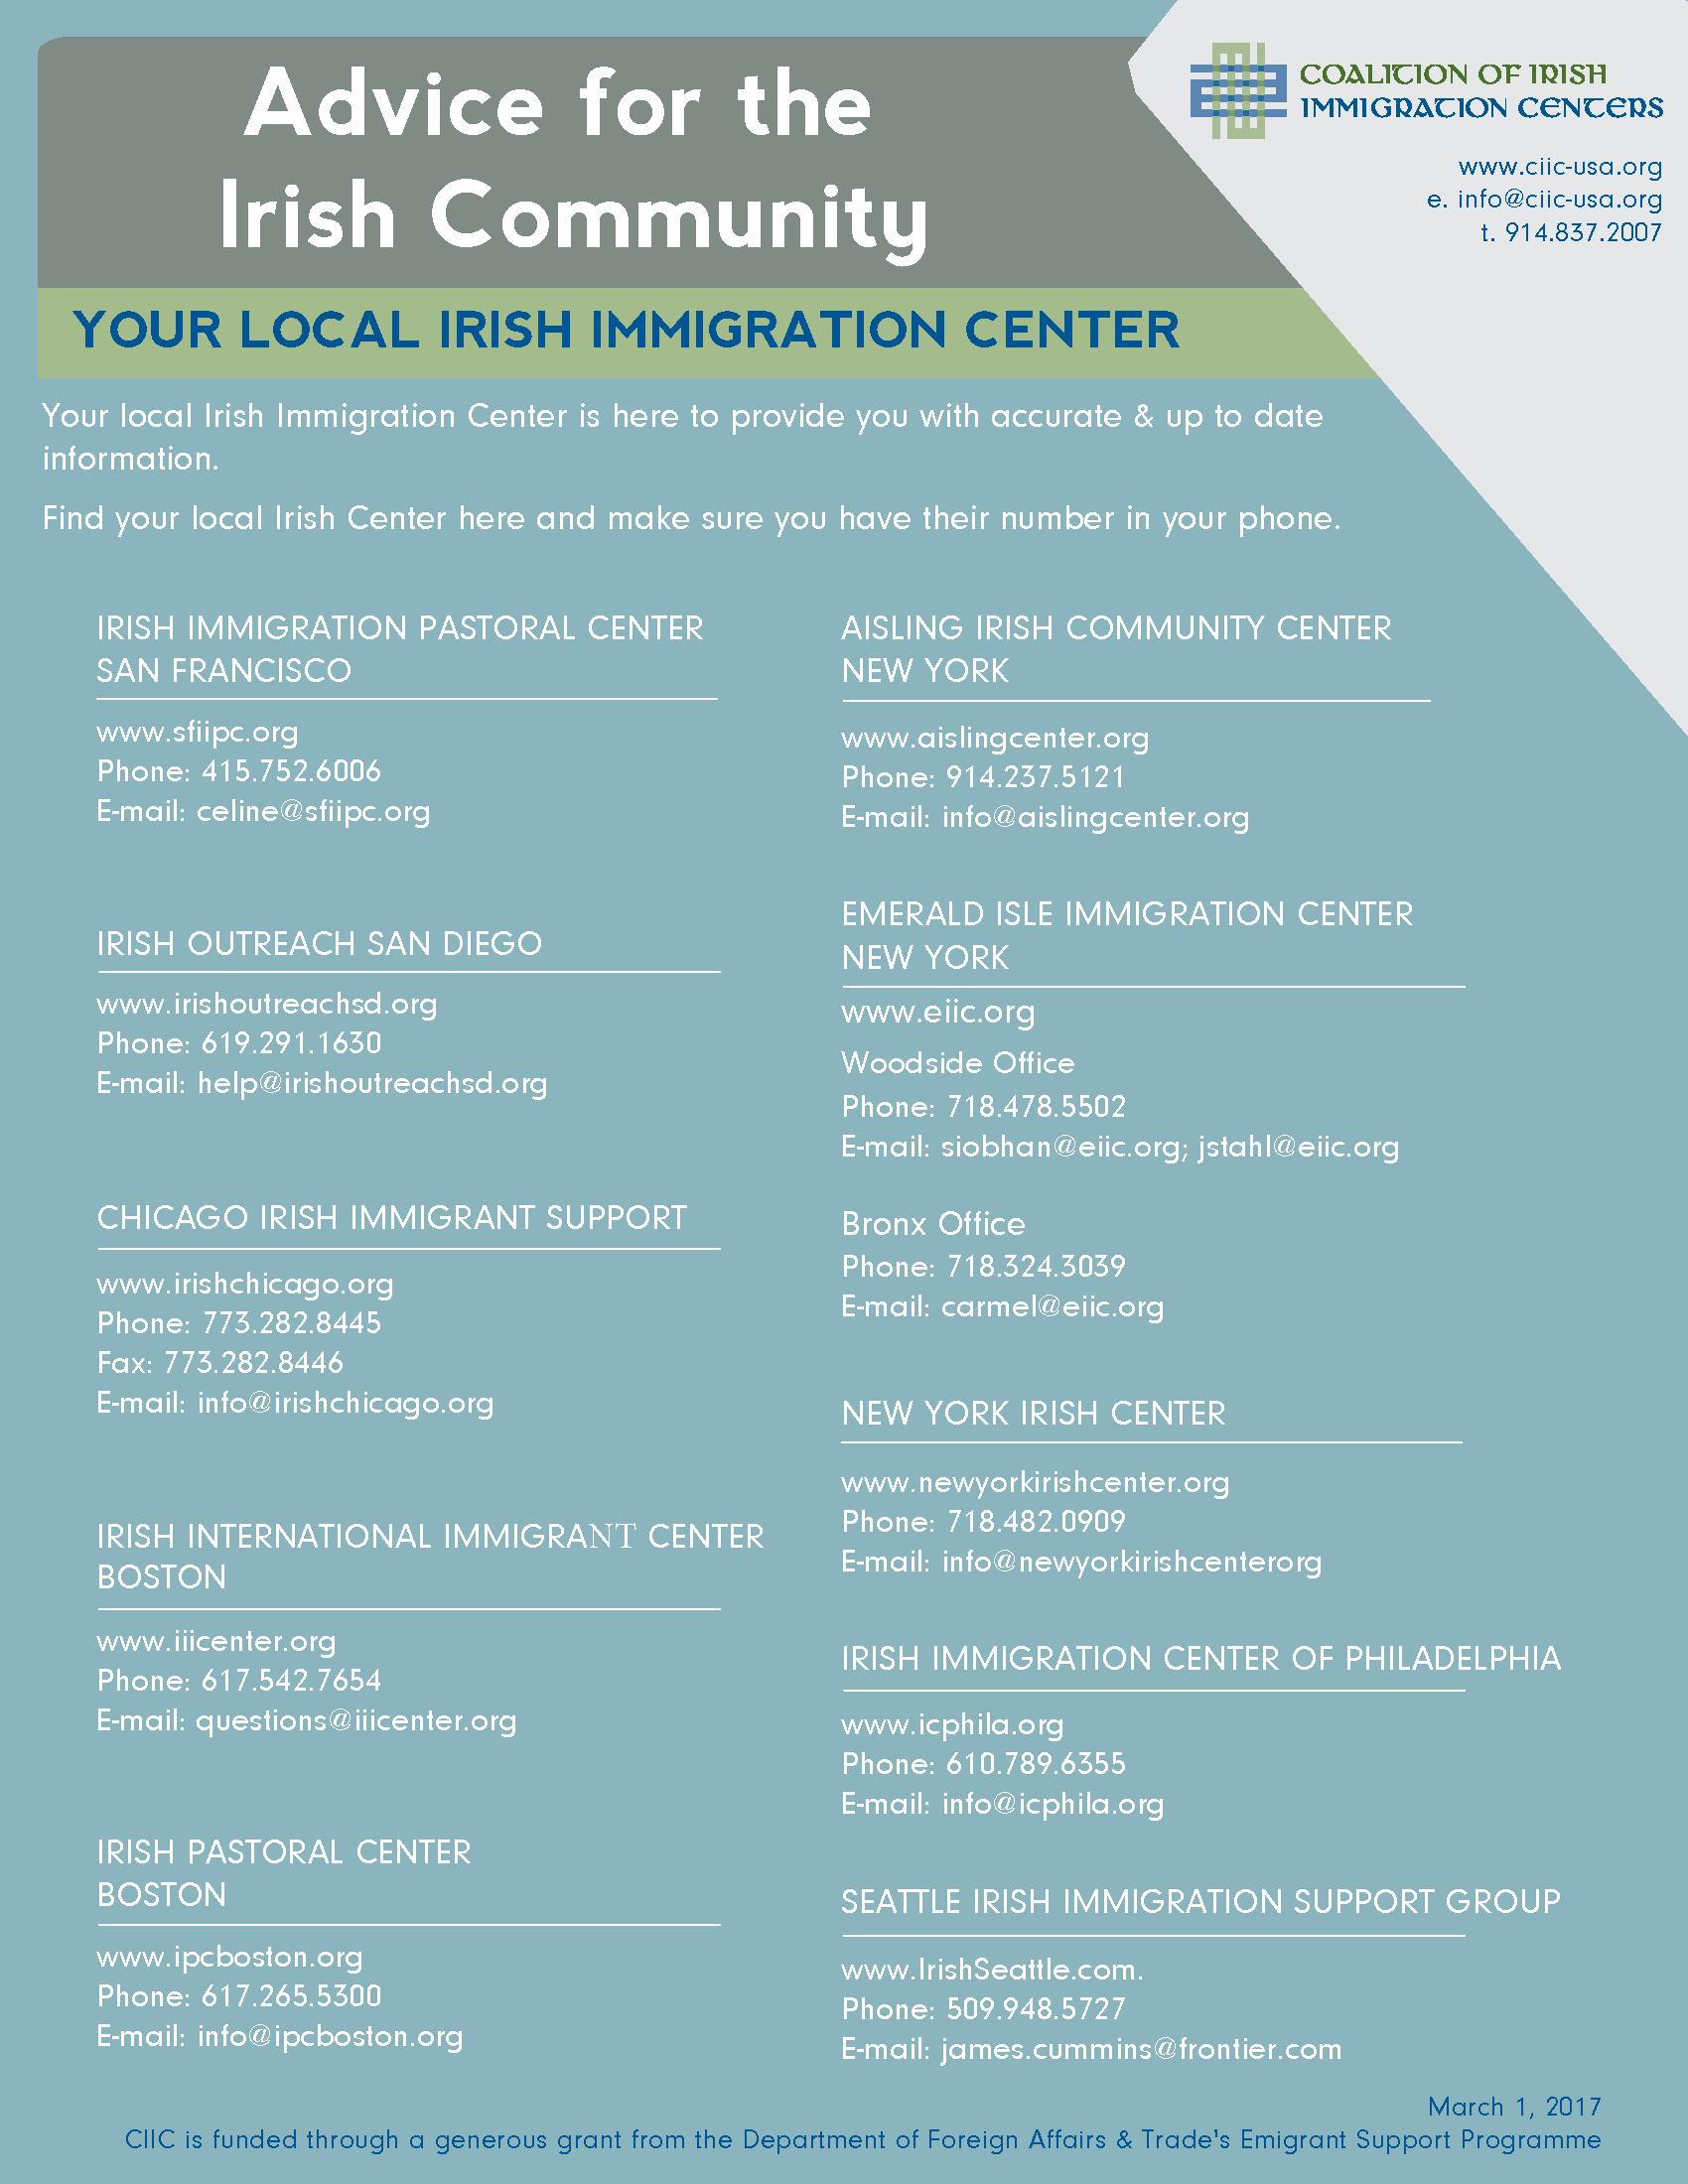 Coalition of Irish Immigration Centers